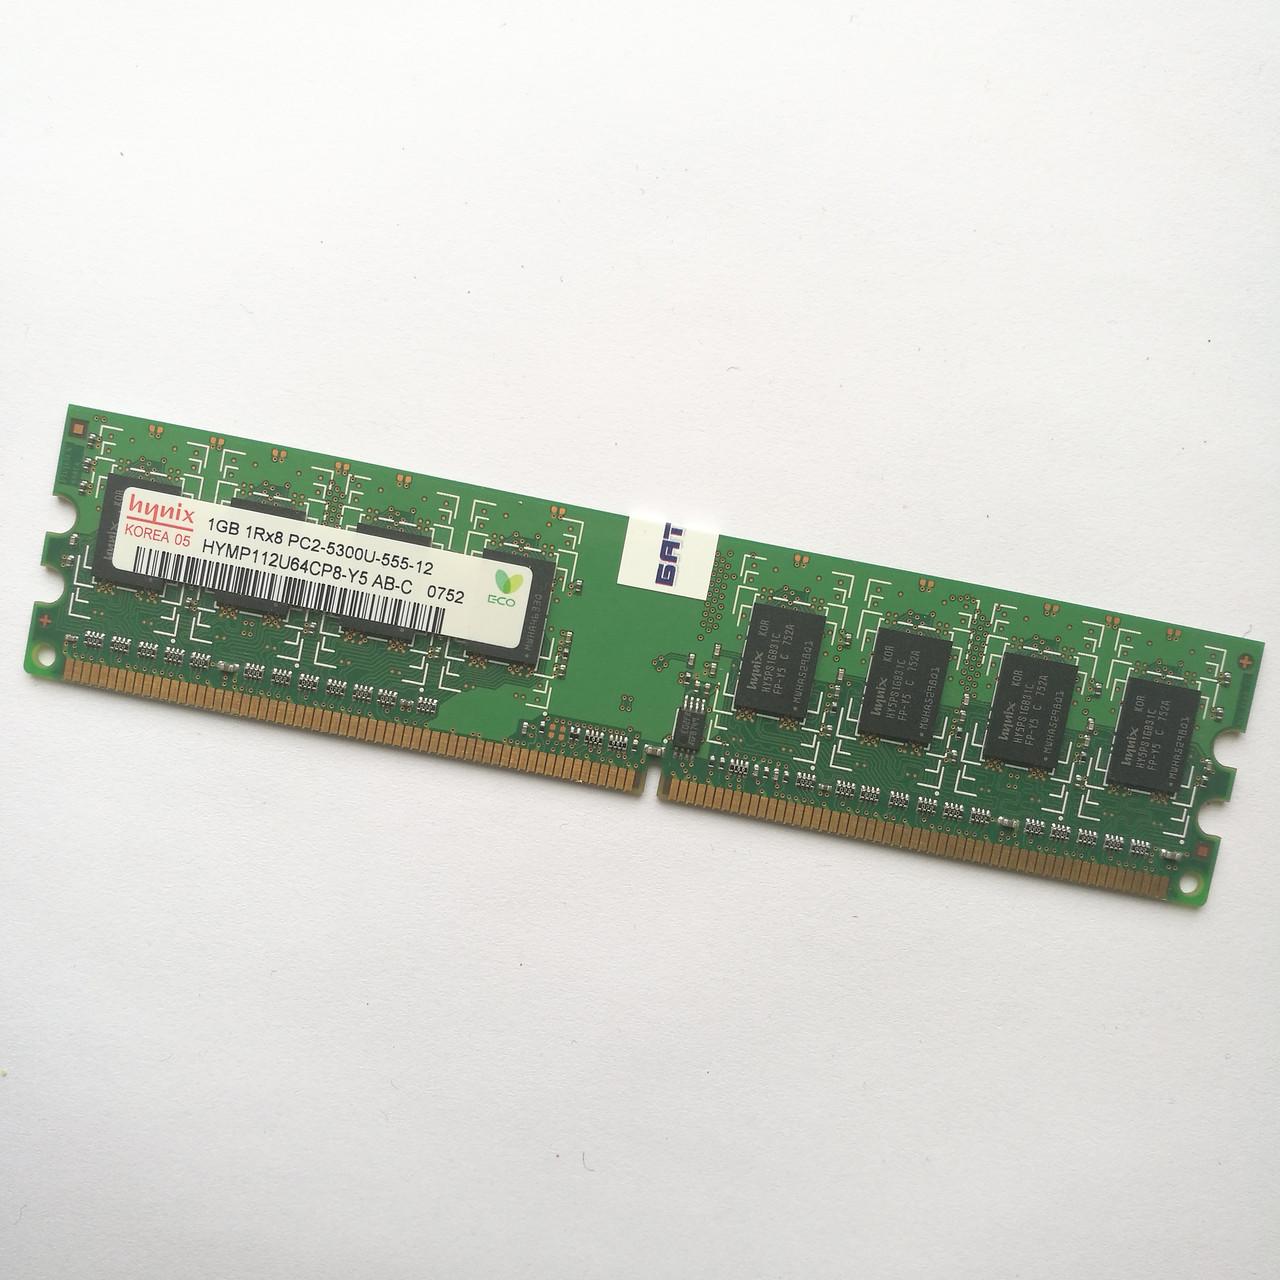 Оперативная память Hynix DDR2 1Gb 667MHz PC2 5300U 1R8 CL5 (HYMP112U64CP8-Y5 AB-C) Б/У